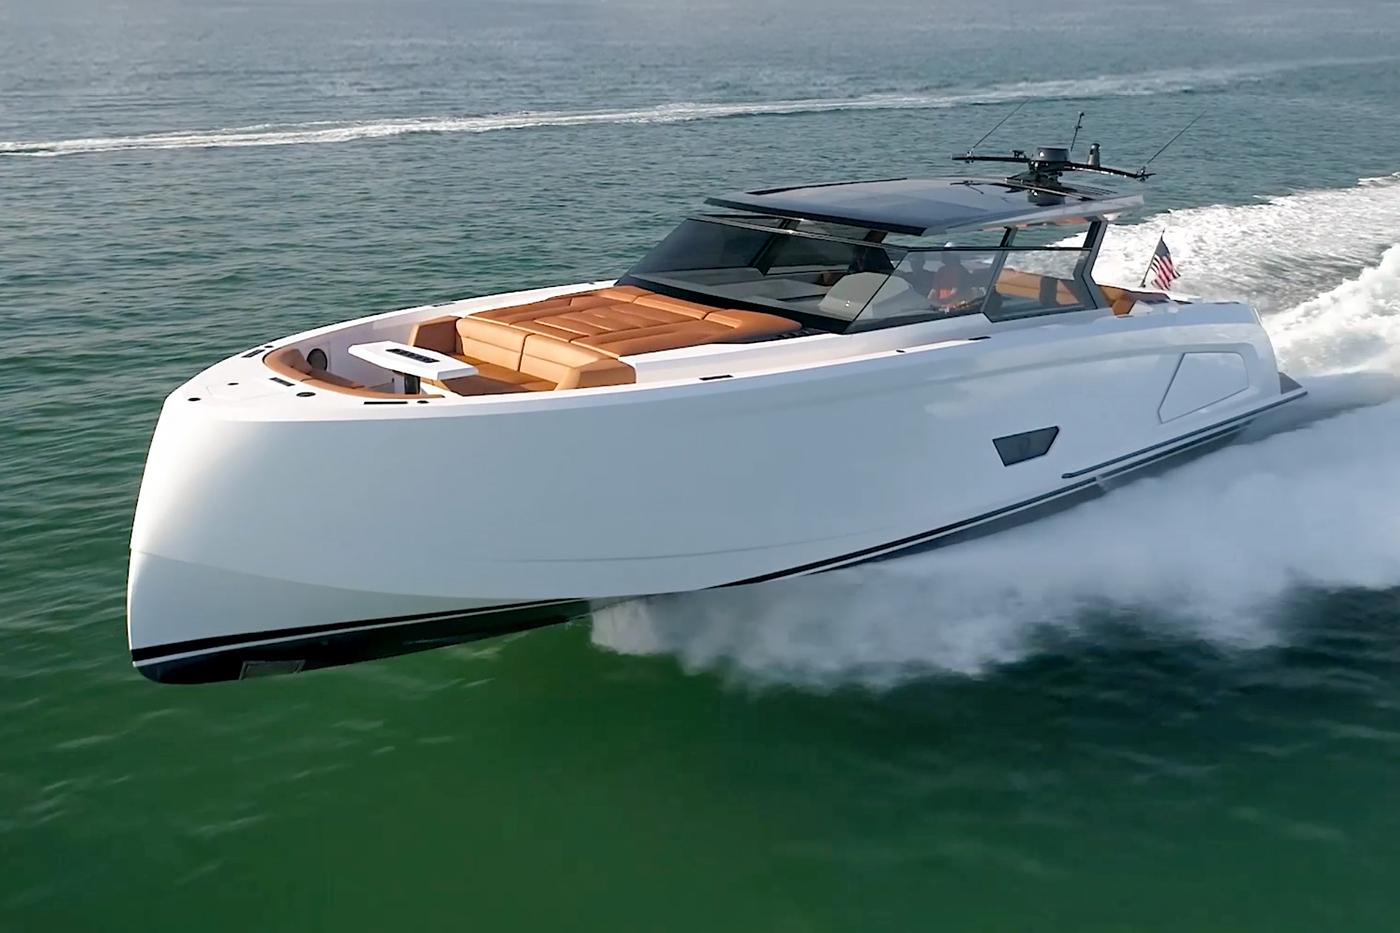 Vanquish Yachts VQ58 Luxury Yacht With Aluminum Hull Design